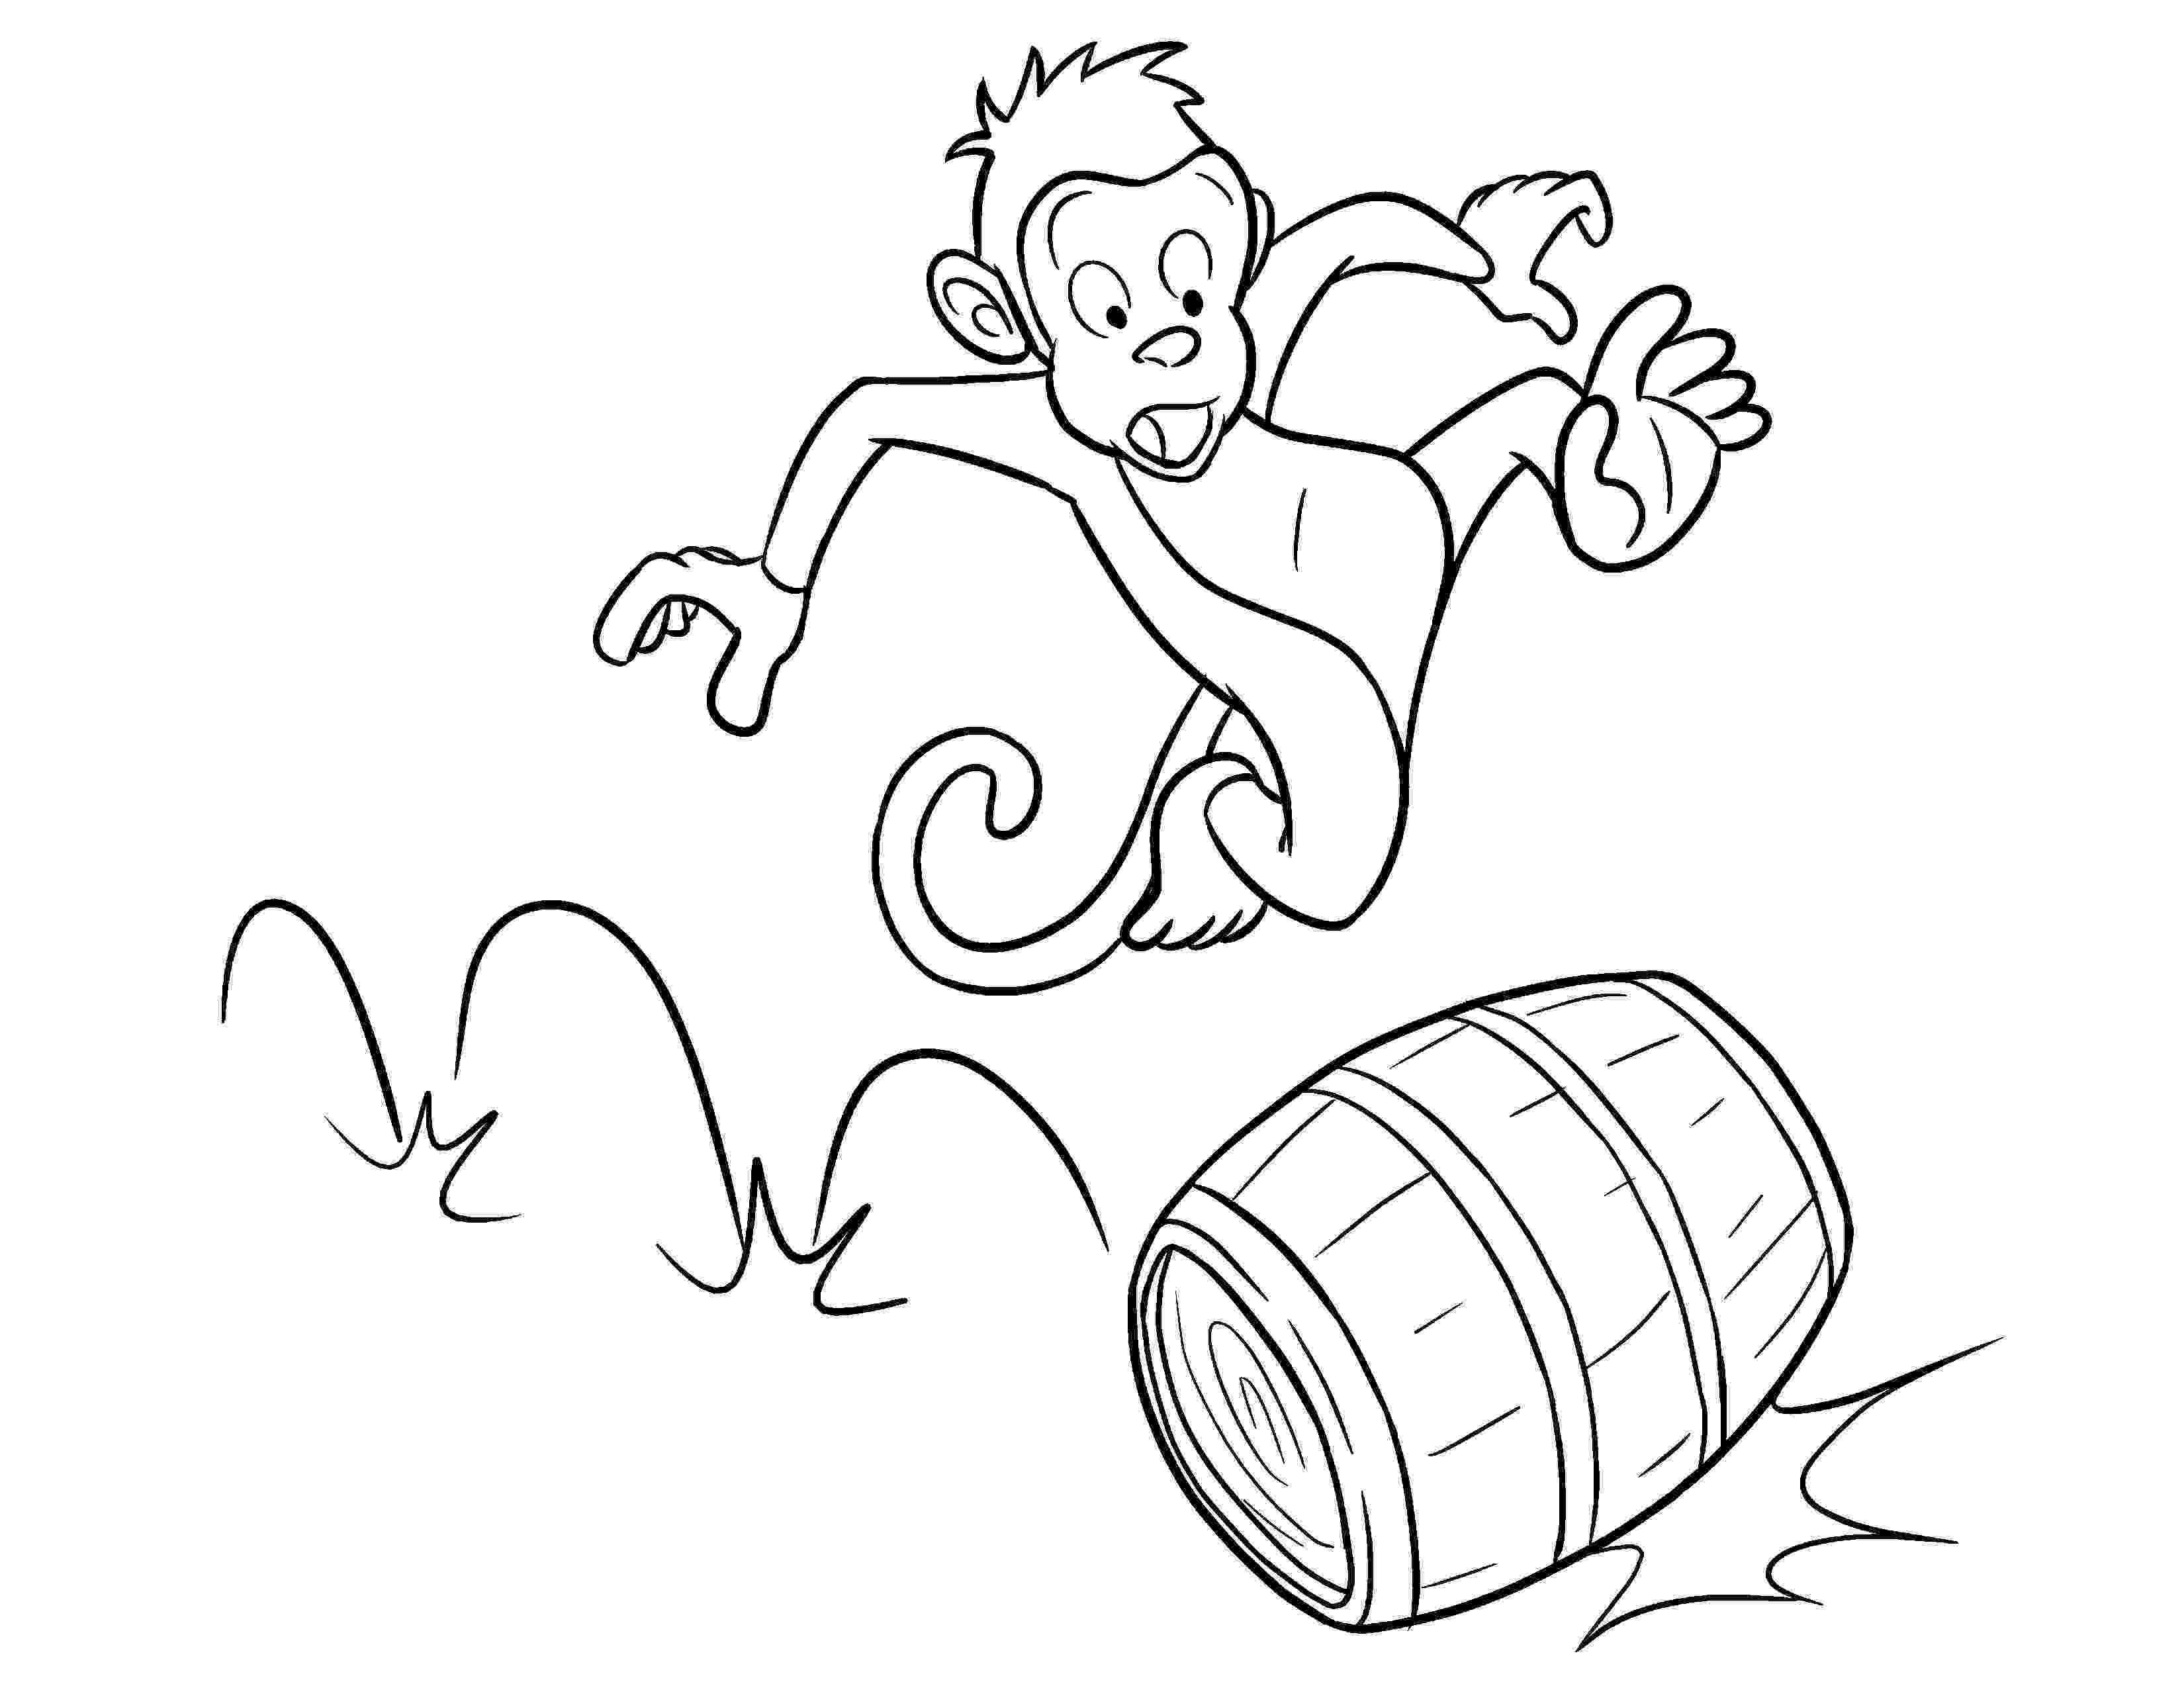 monkey cartoon coloring free printable monkey coloring pages for kids cartoon coloring monkey